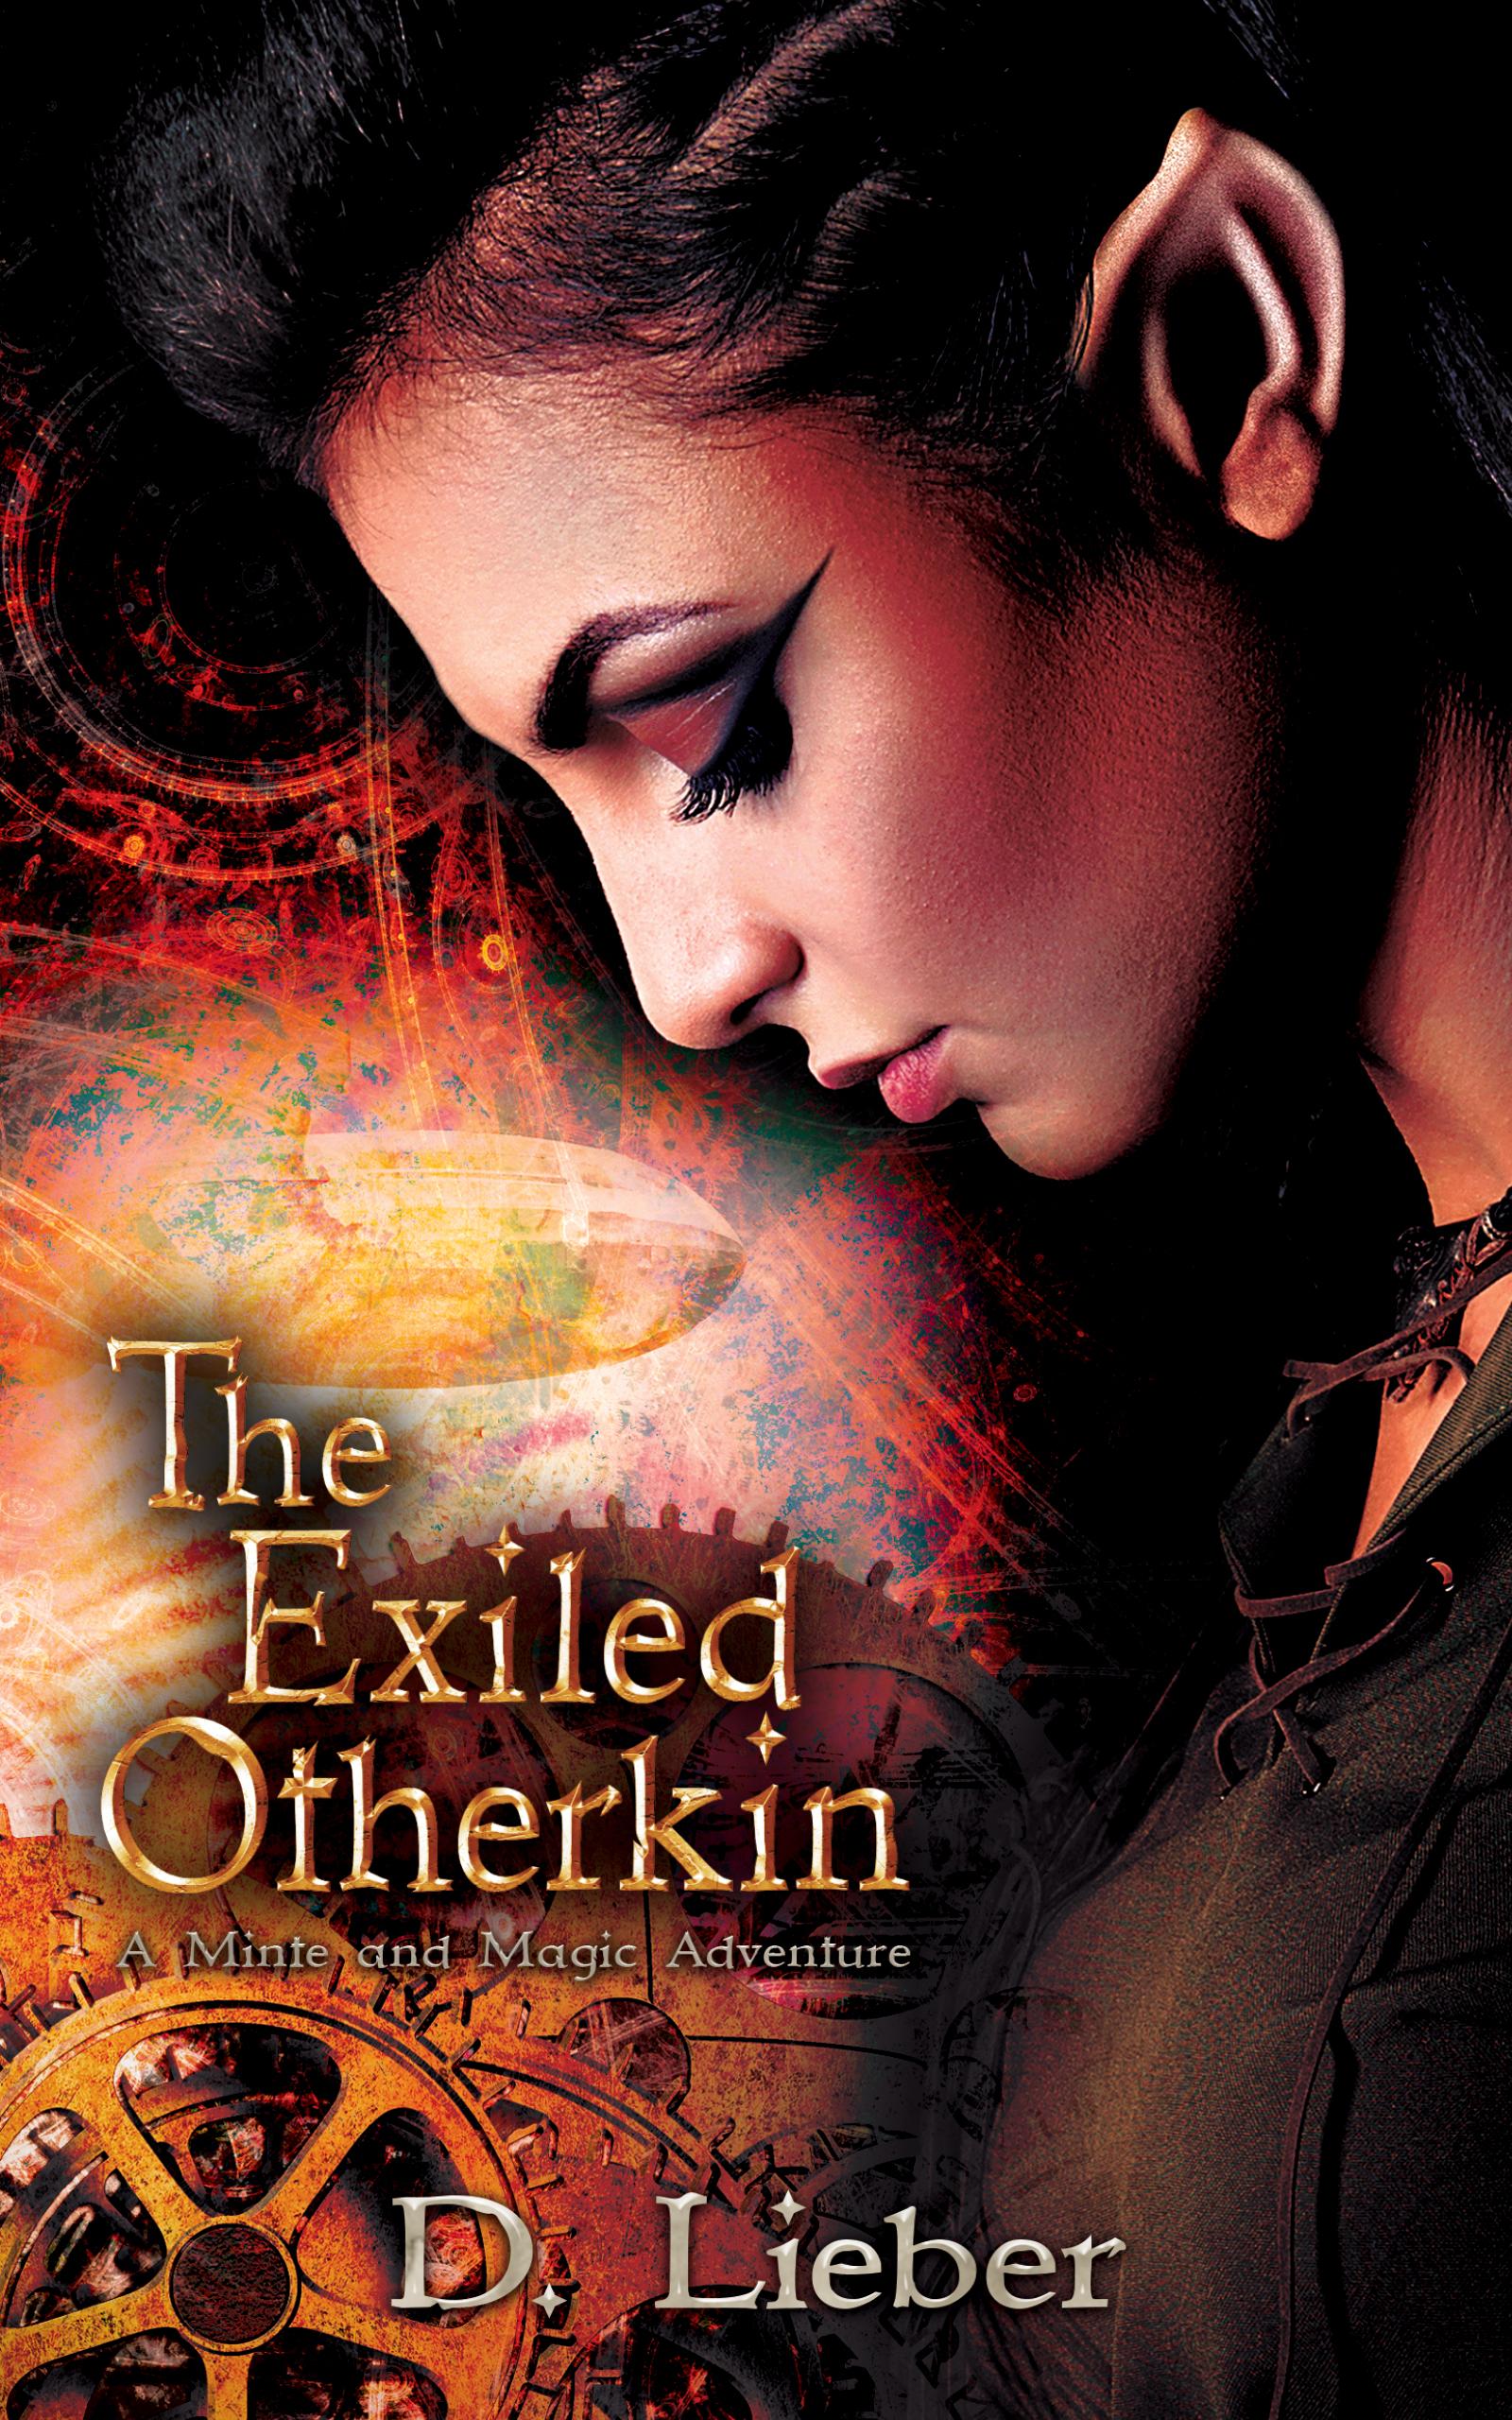 Exiled Otherkin - ebook